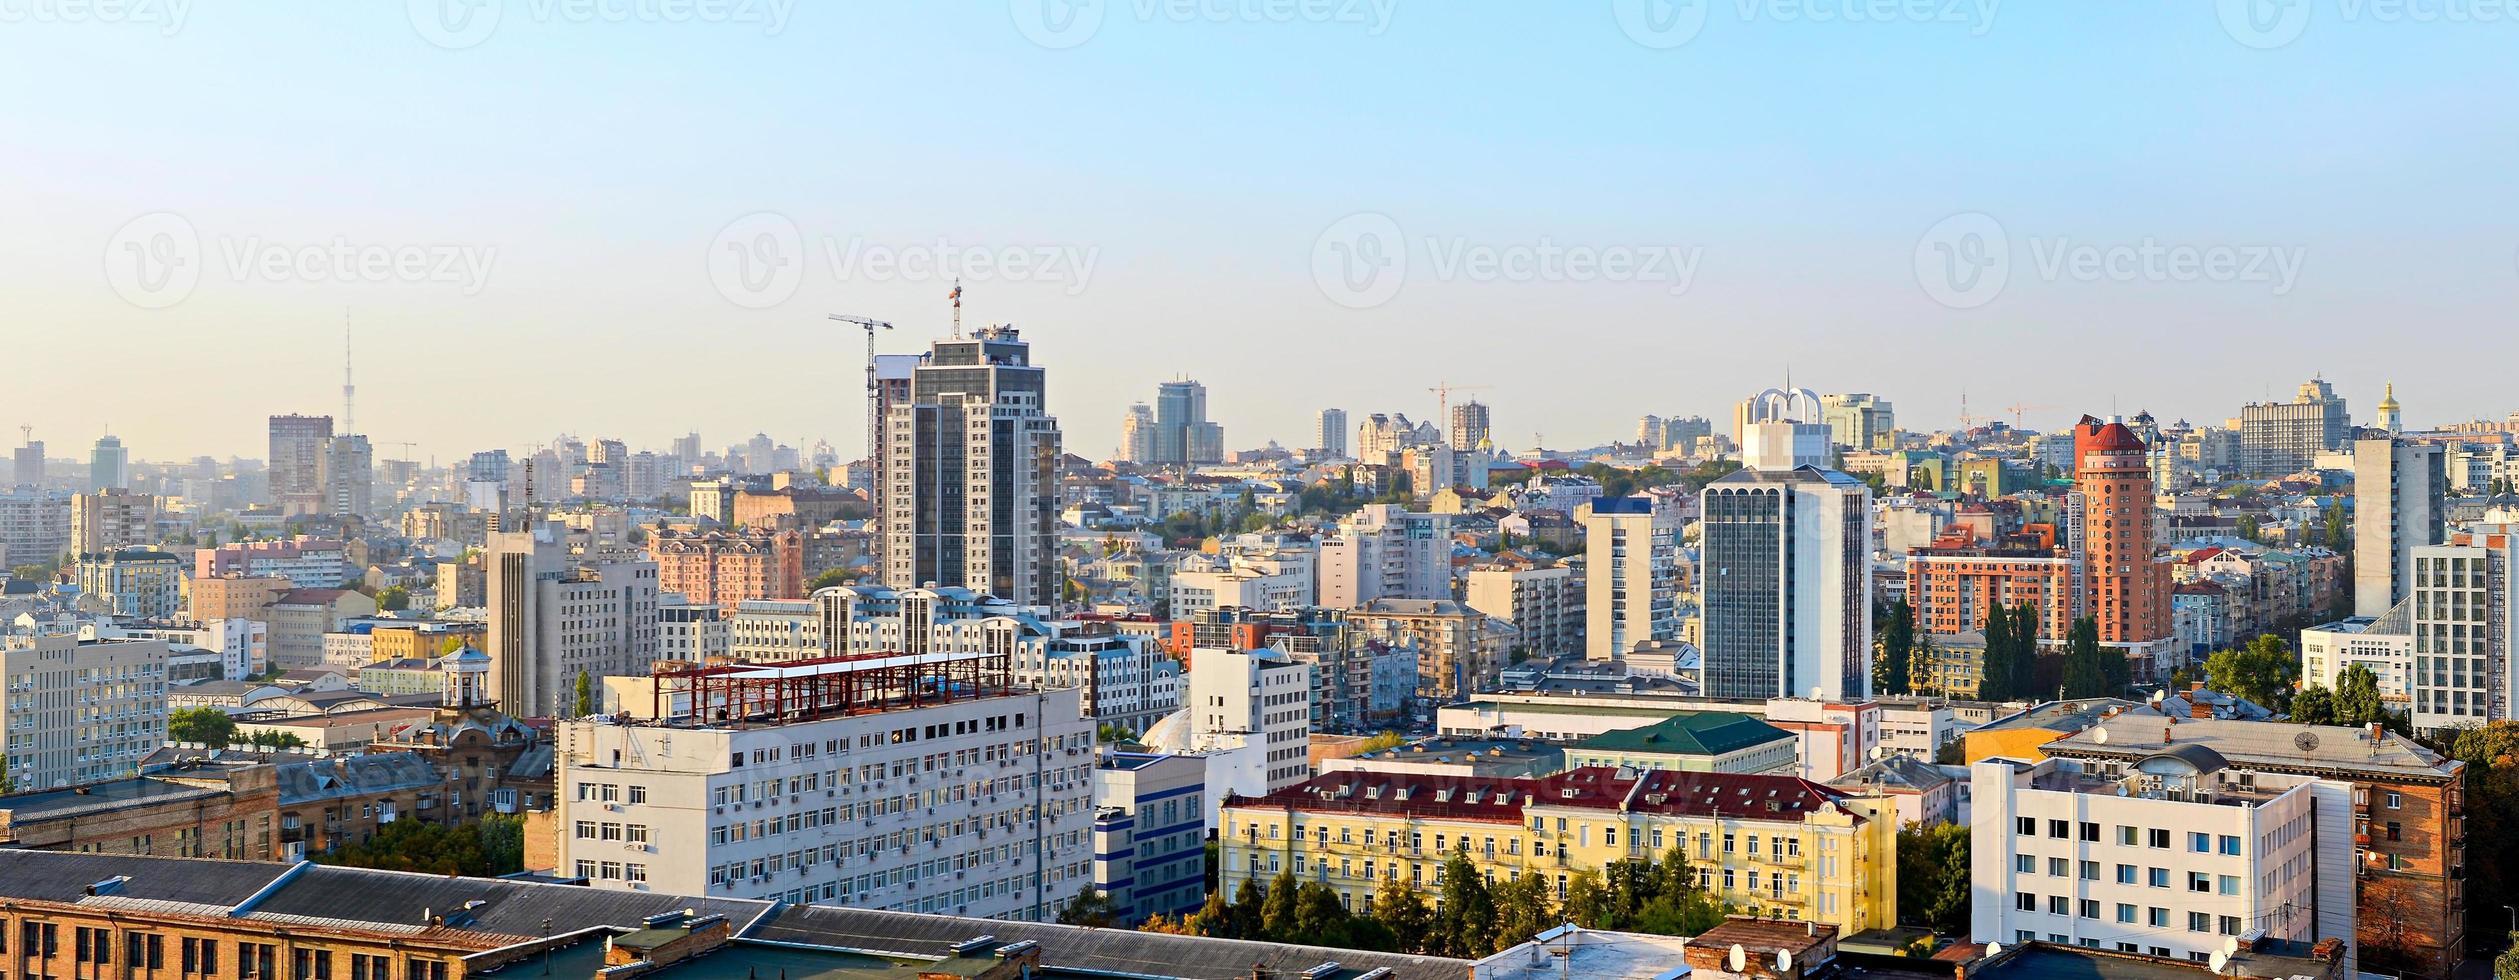 Kyiv skyline, Ucraina foto